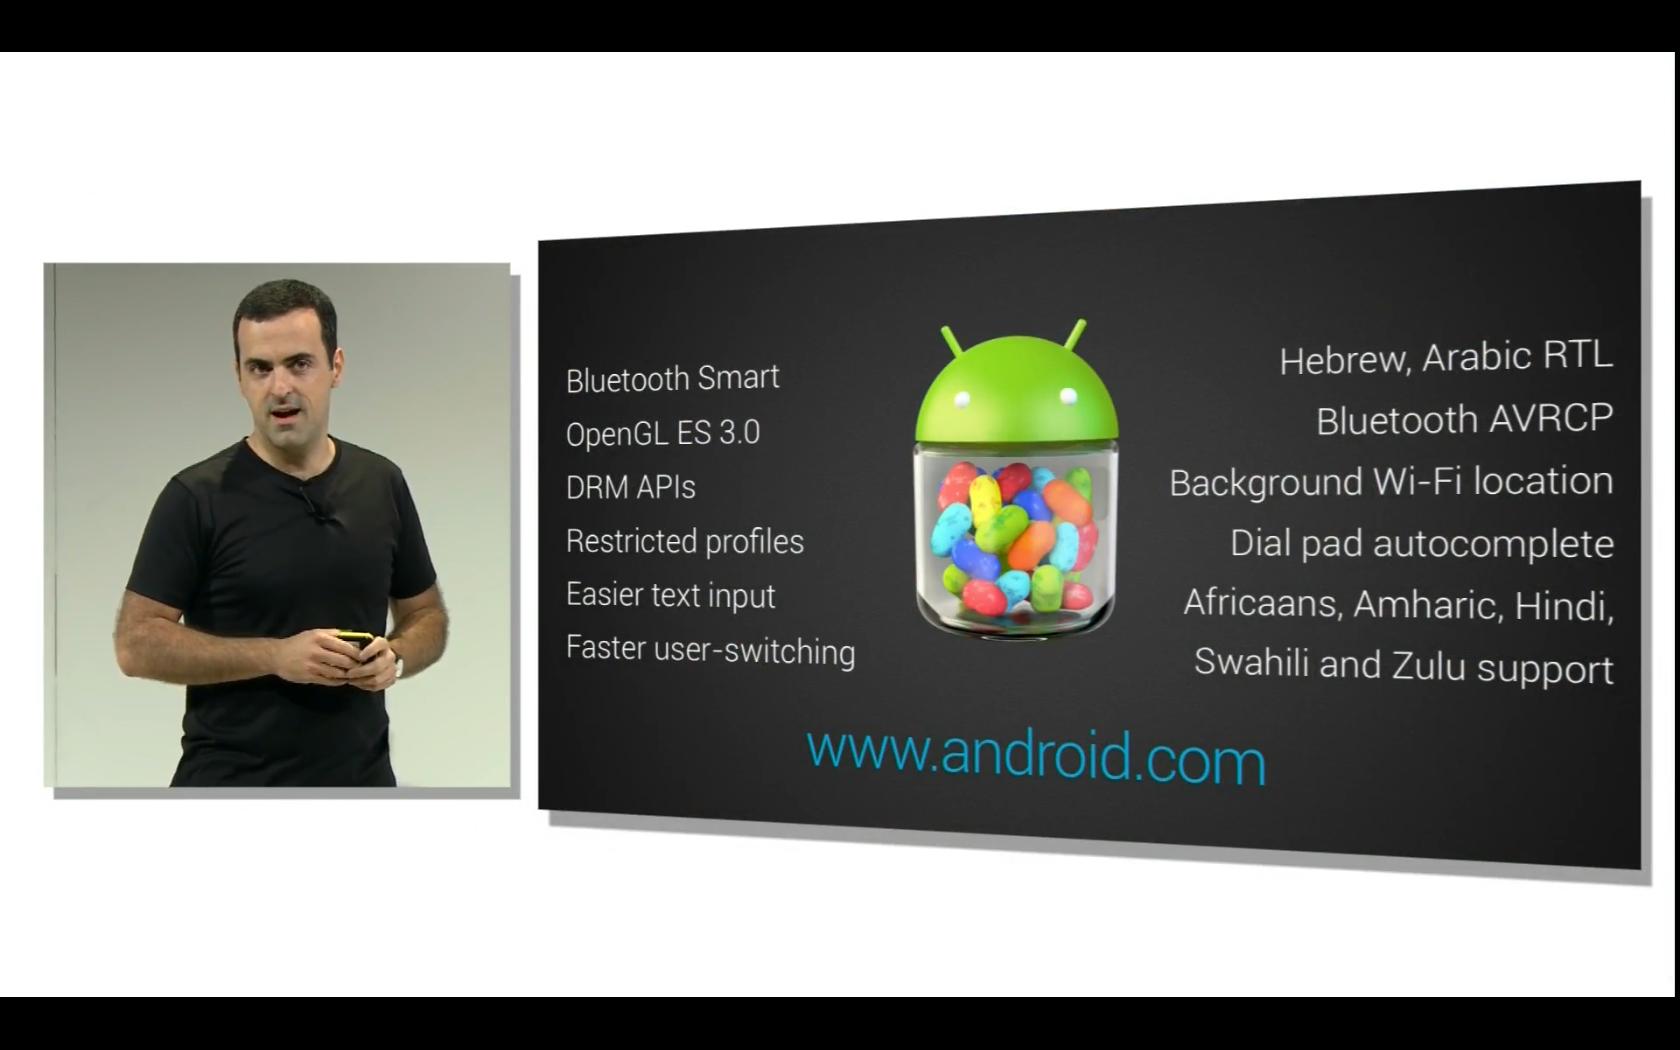 Stáhněte si Android 4.3 pro Nexus 4, Galaxy Nexus, Nexus 7 a Nexus 10